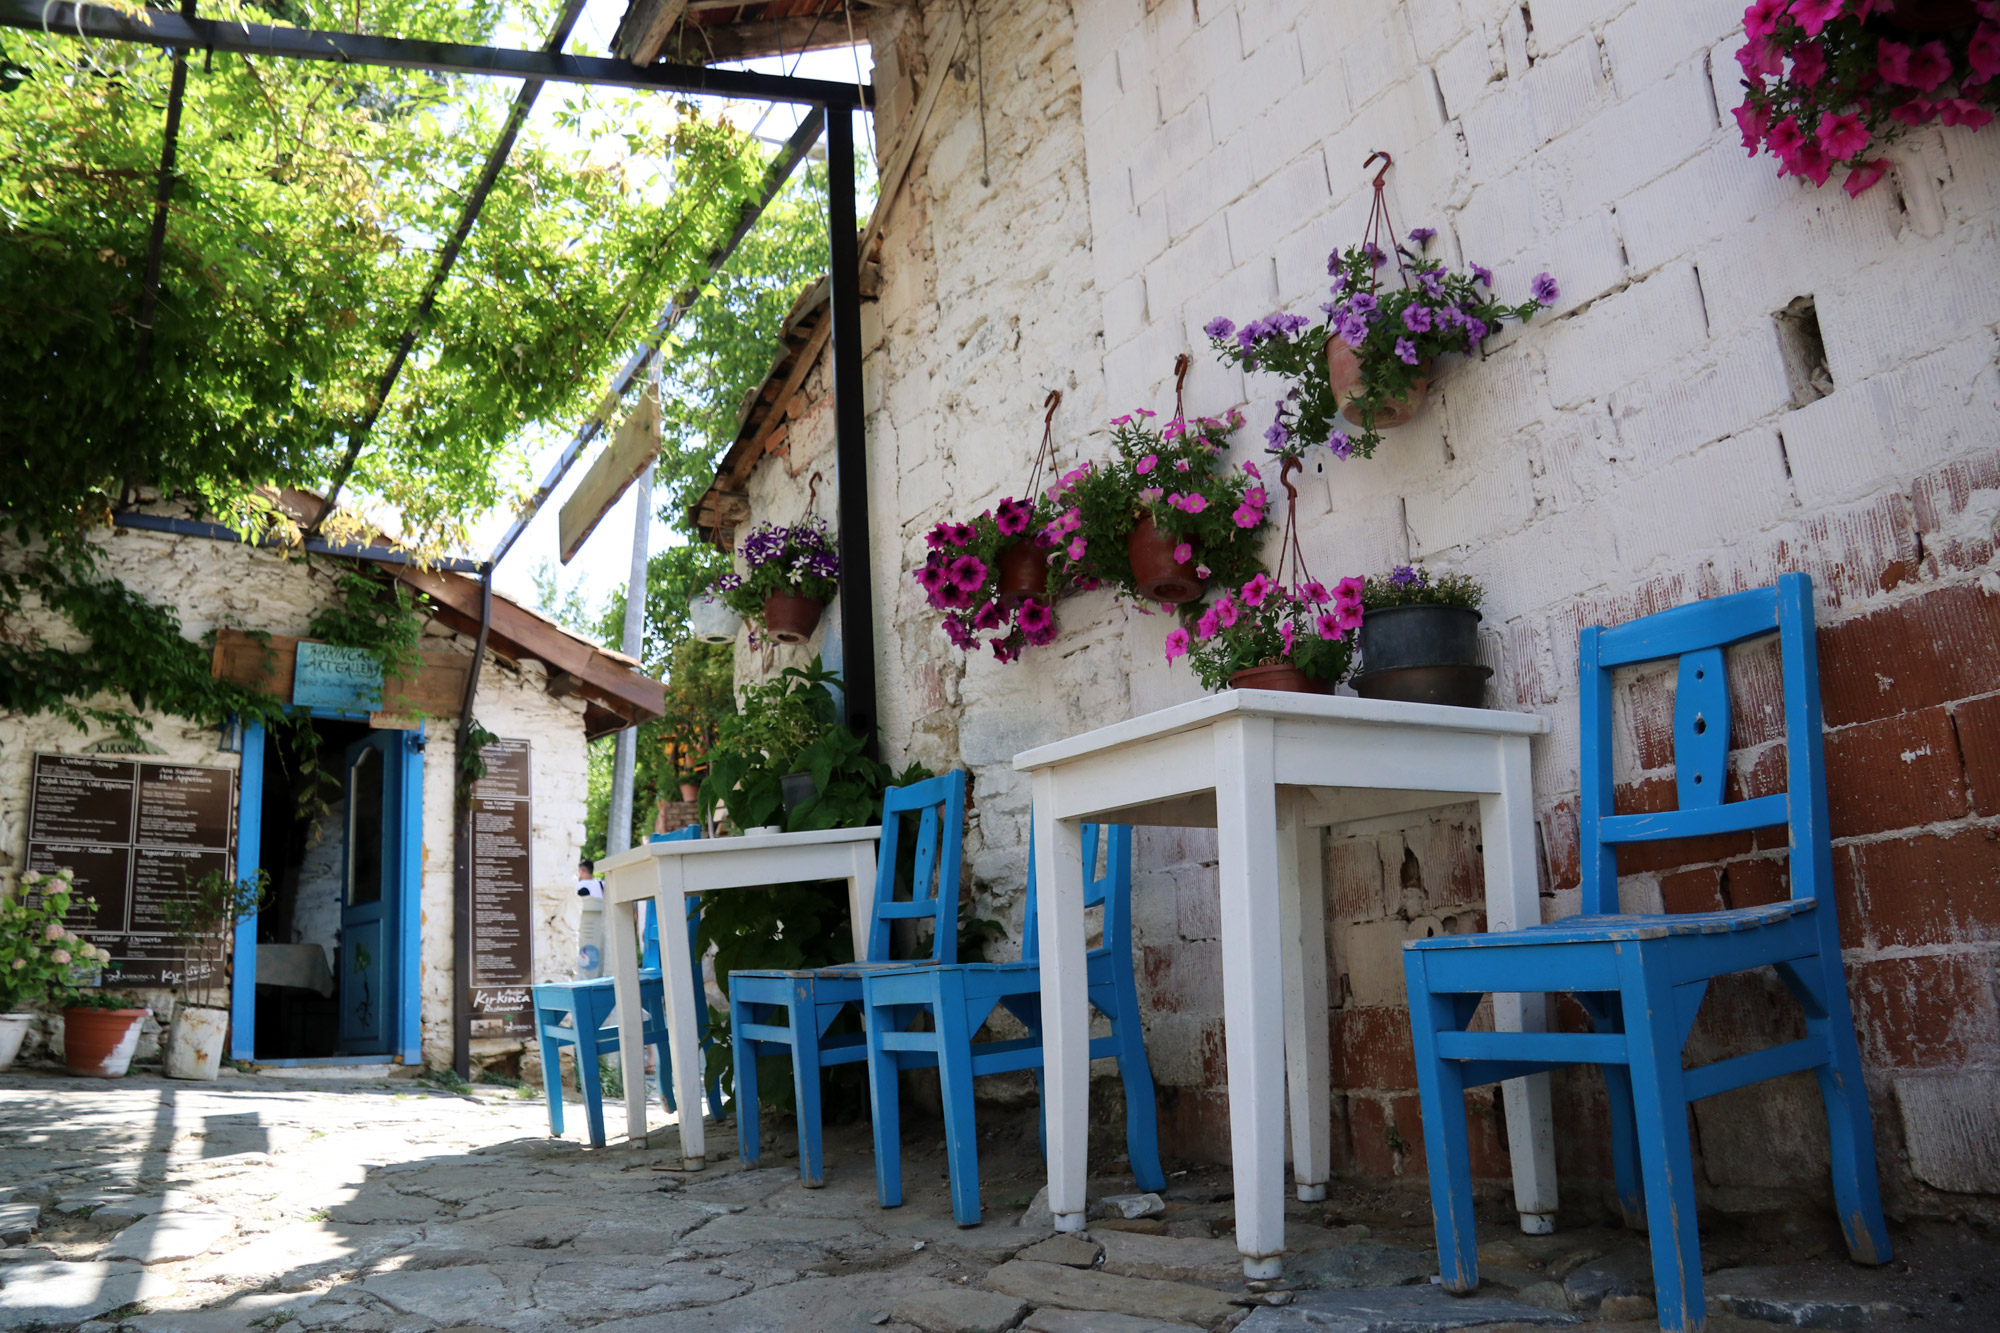 Turkije reisverslag: Efeze en Şirince - Sfeervolle straatjes